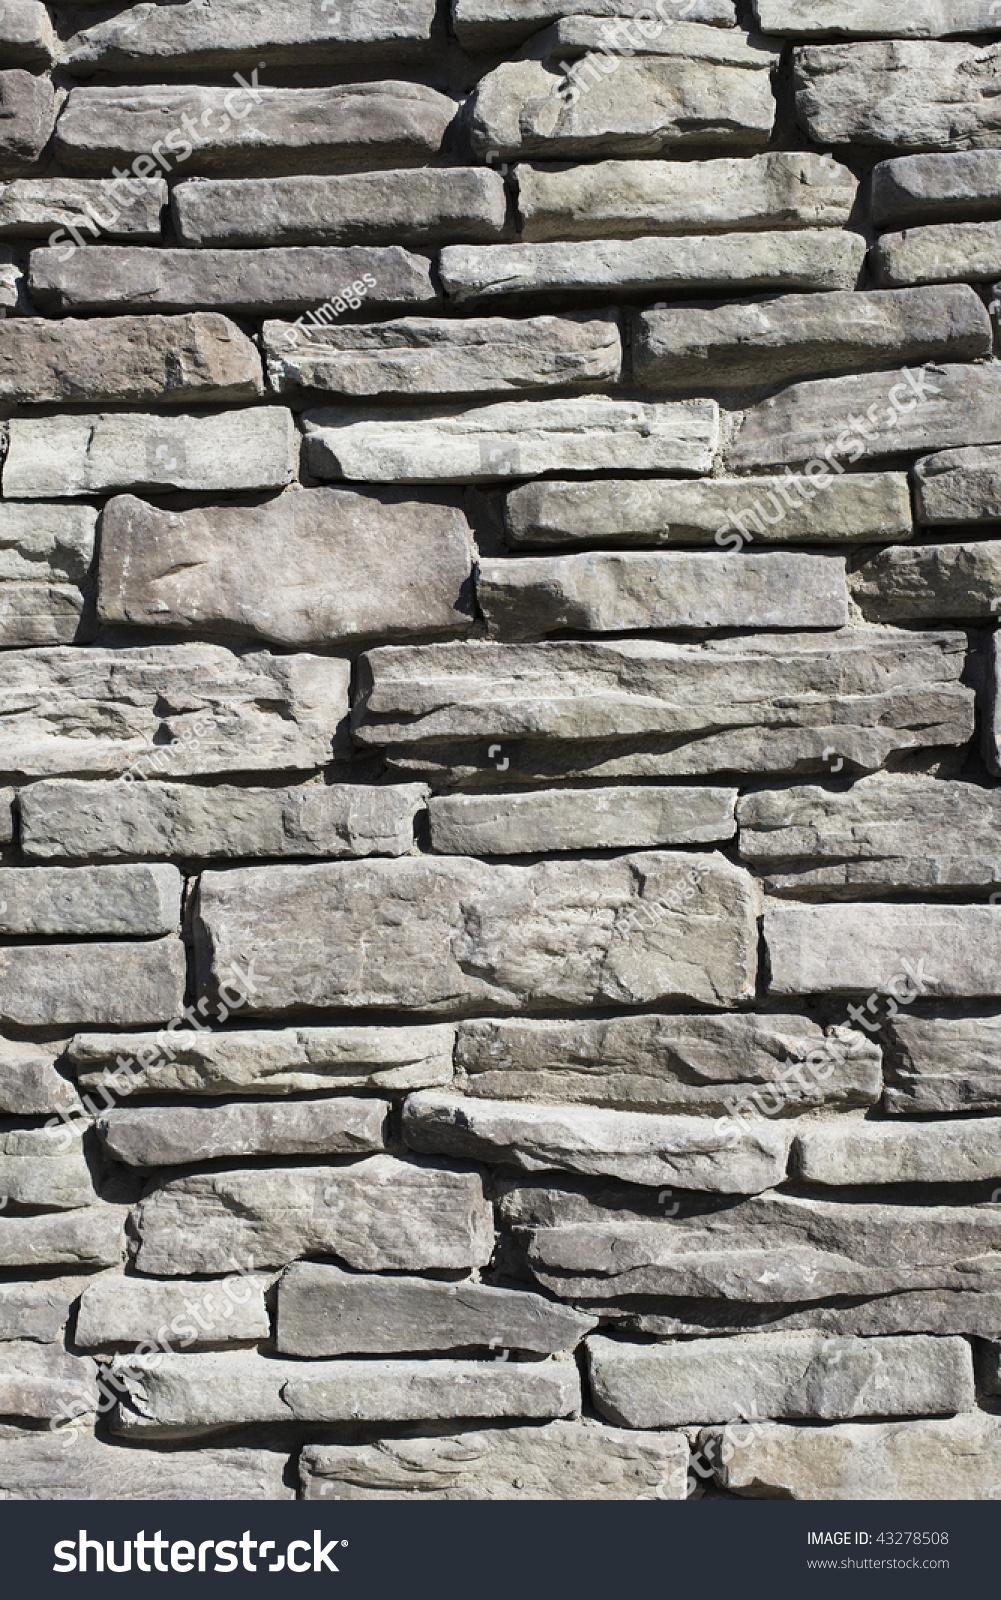 Detail Stone Slabs : Closeup detail of a gray slab stone wall stock photo